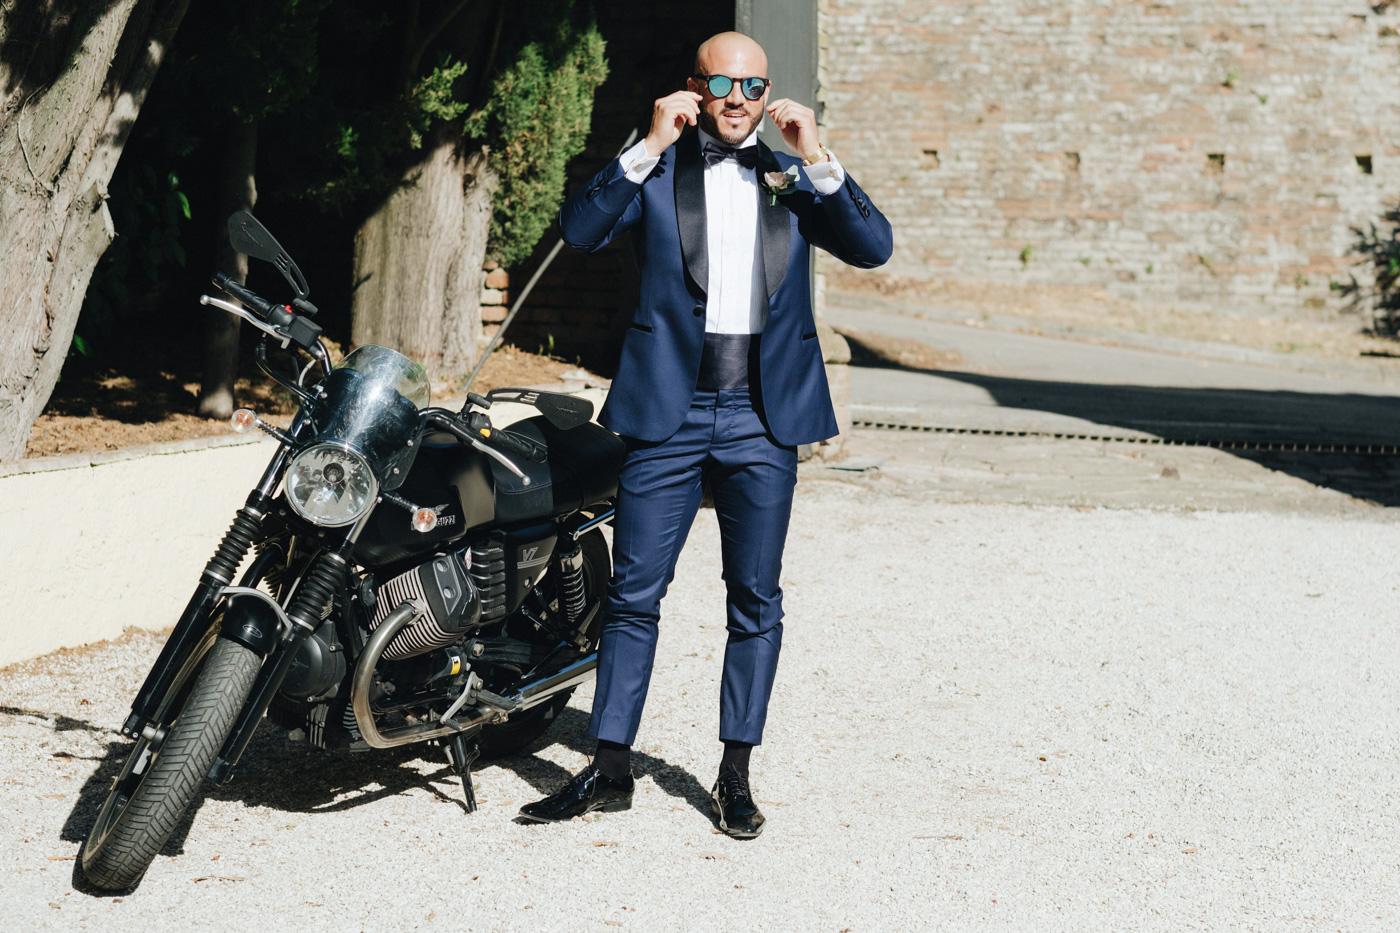 Matrimoni all'italiana wedding photographer italy-47.jpg